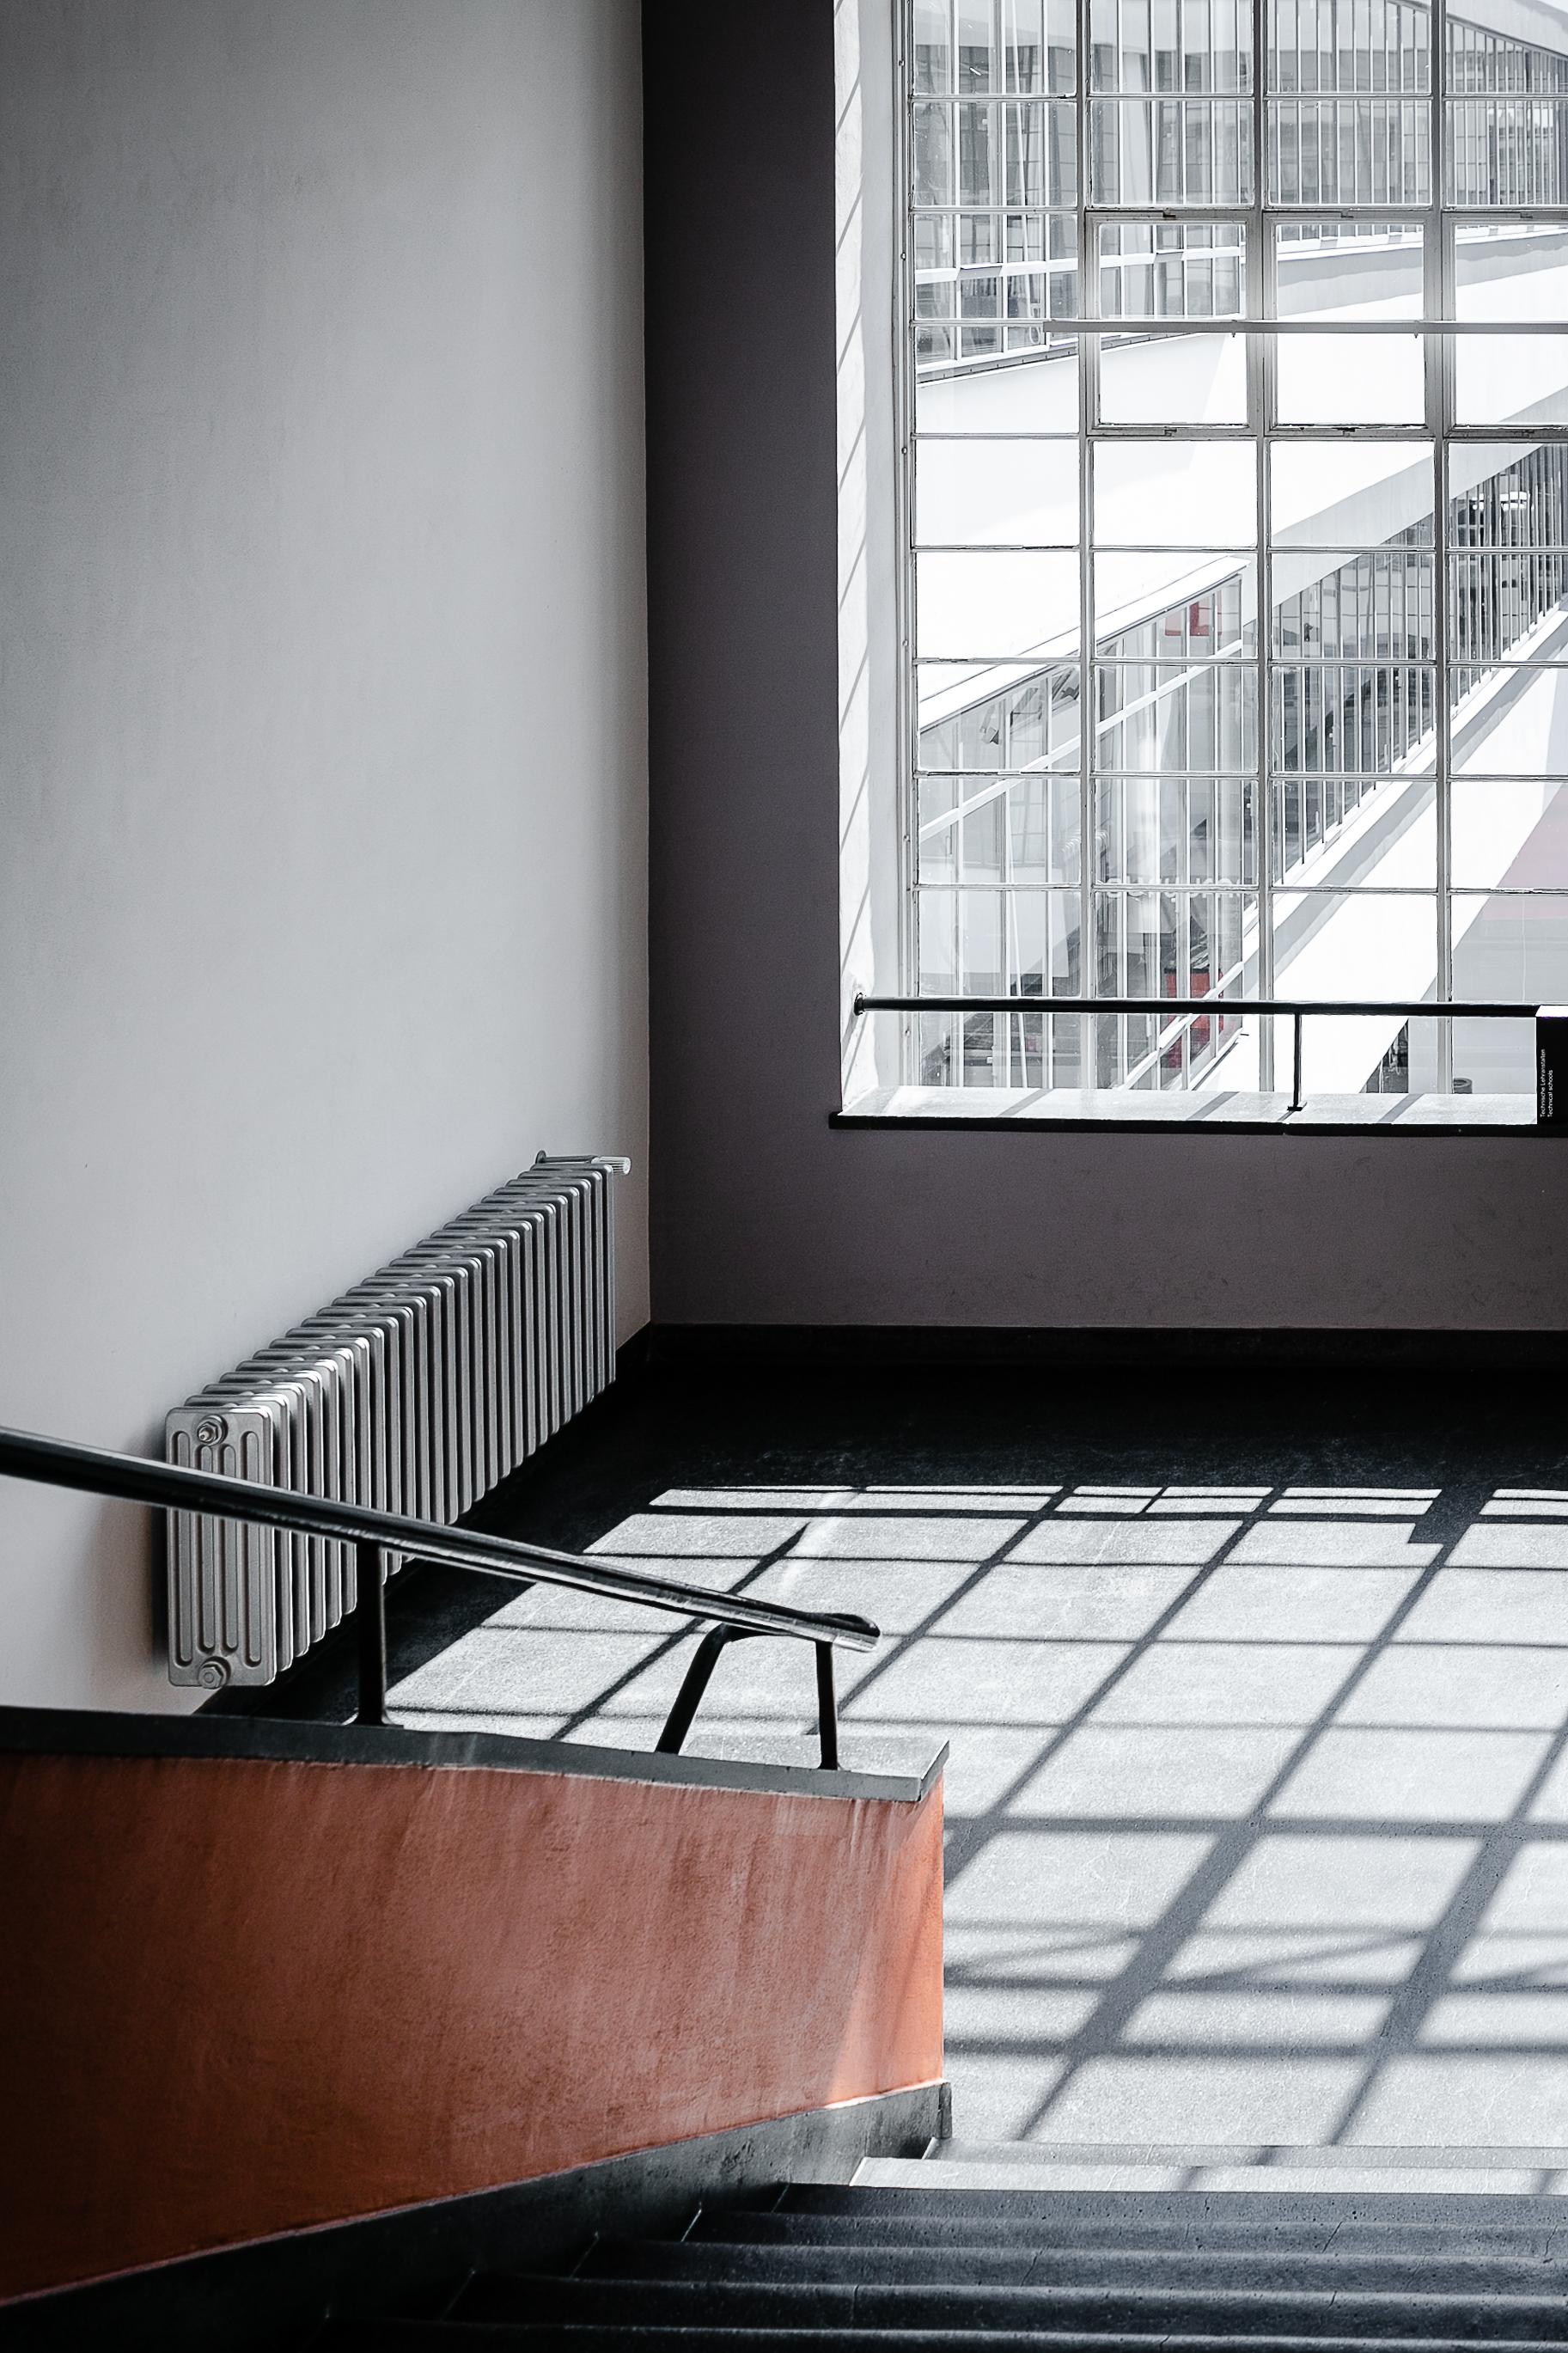 The Bauhaus School Building Dessau